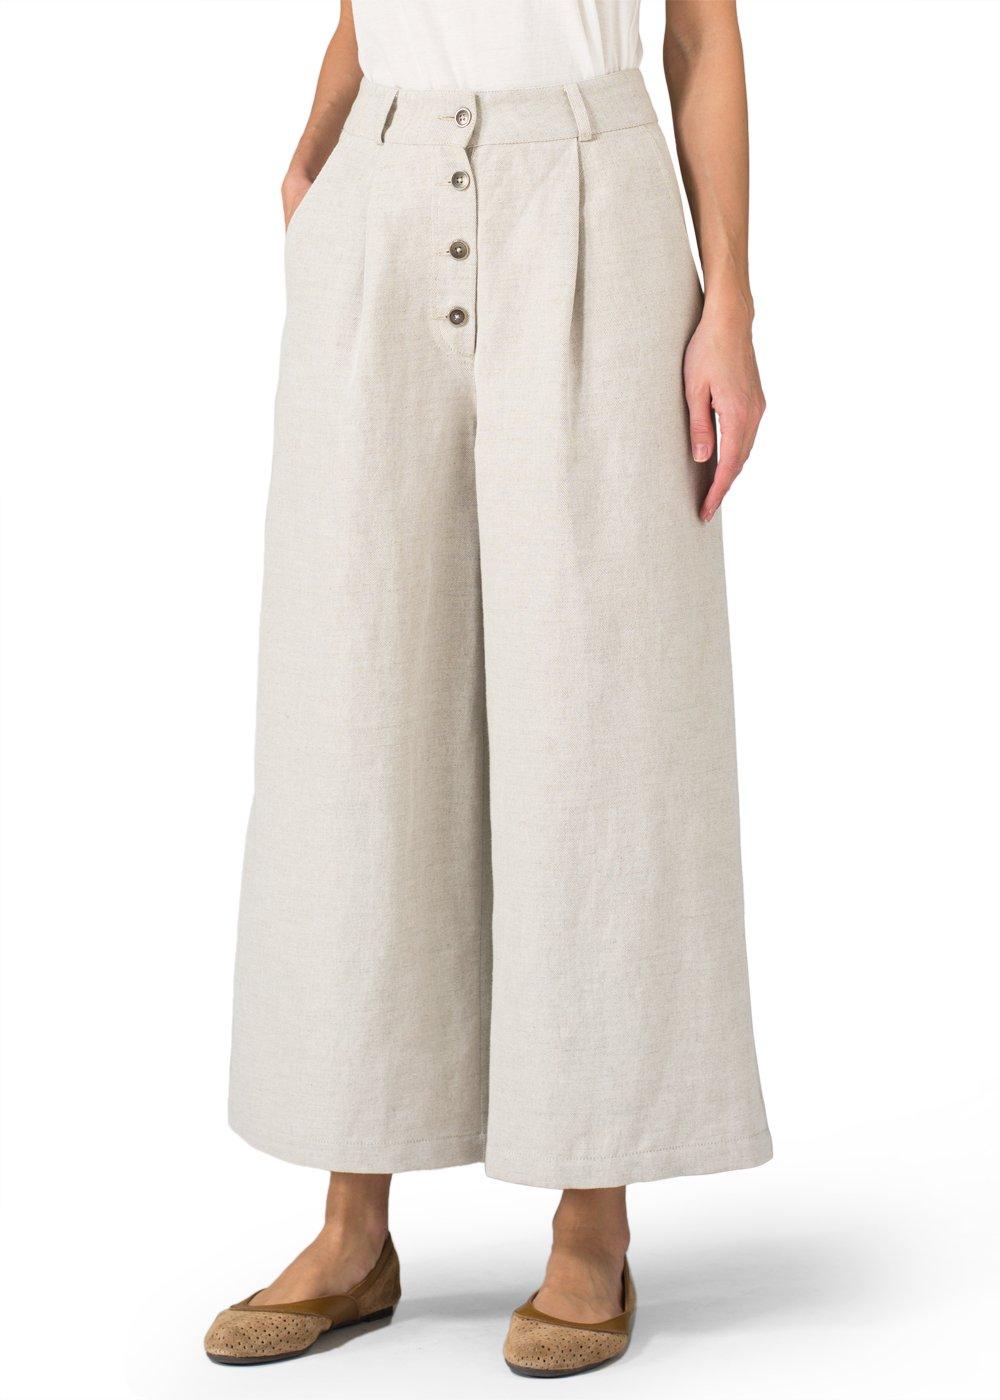 Vivid Linen High Waist Wide Leg Linen/Cotton Pants-16-Two Tone Oat